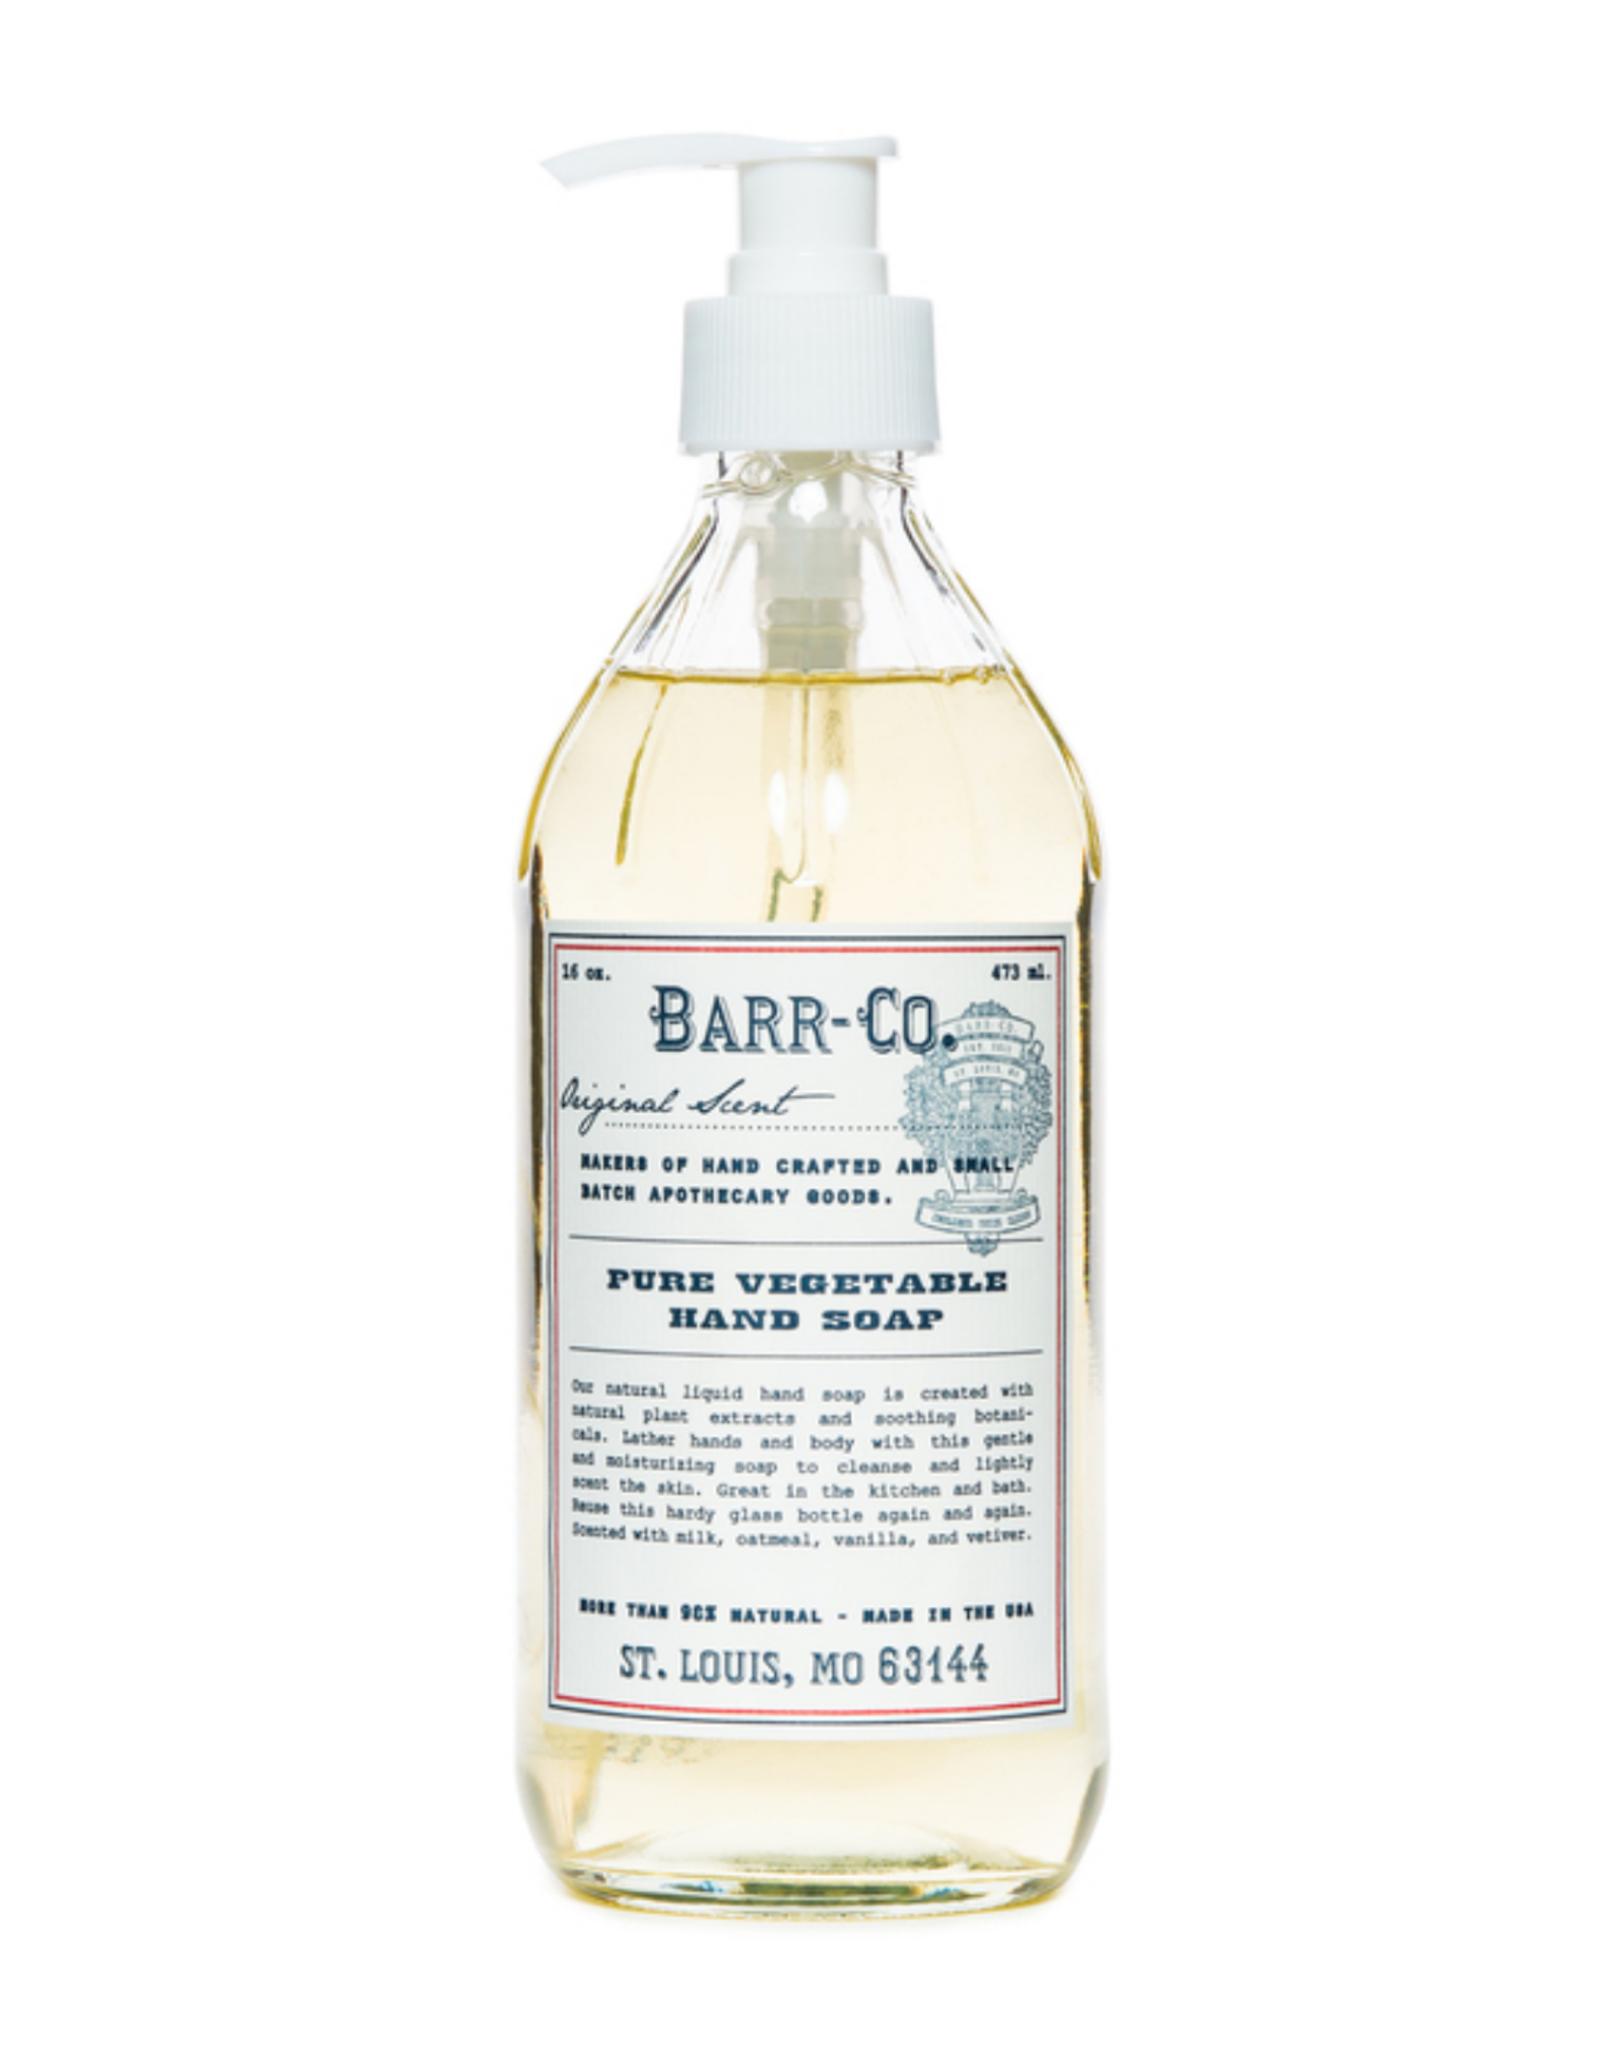 Barr Co Barr Co Original Scent Hand Soap